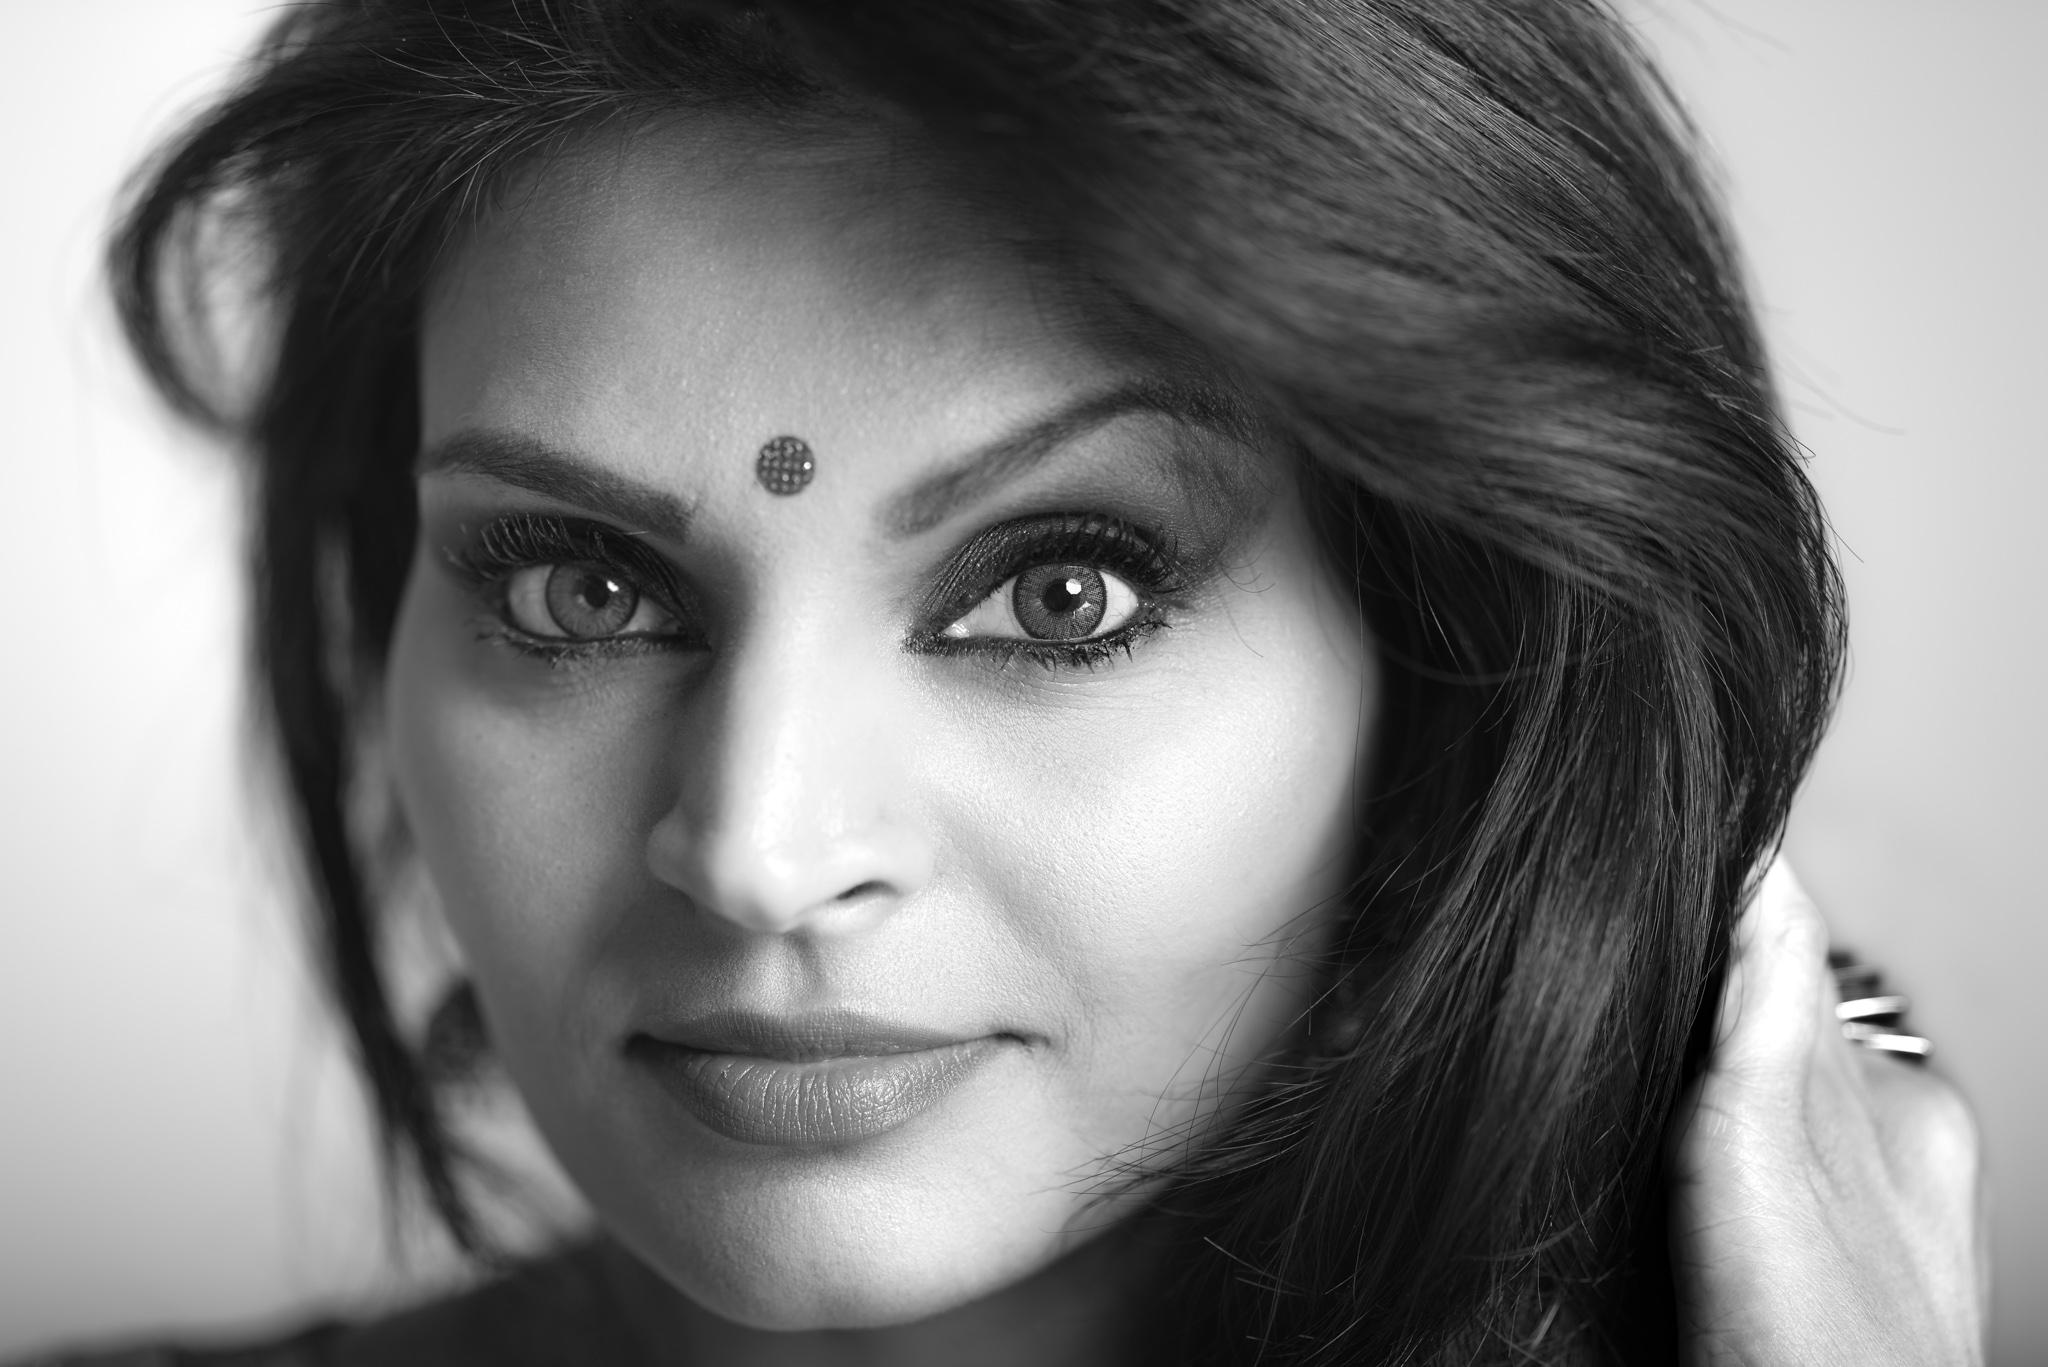 Model: Anita Syed